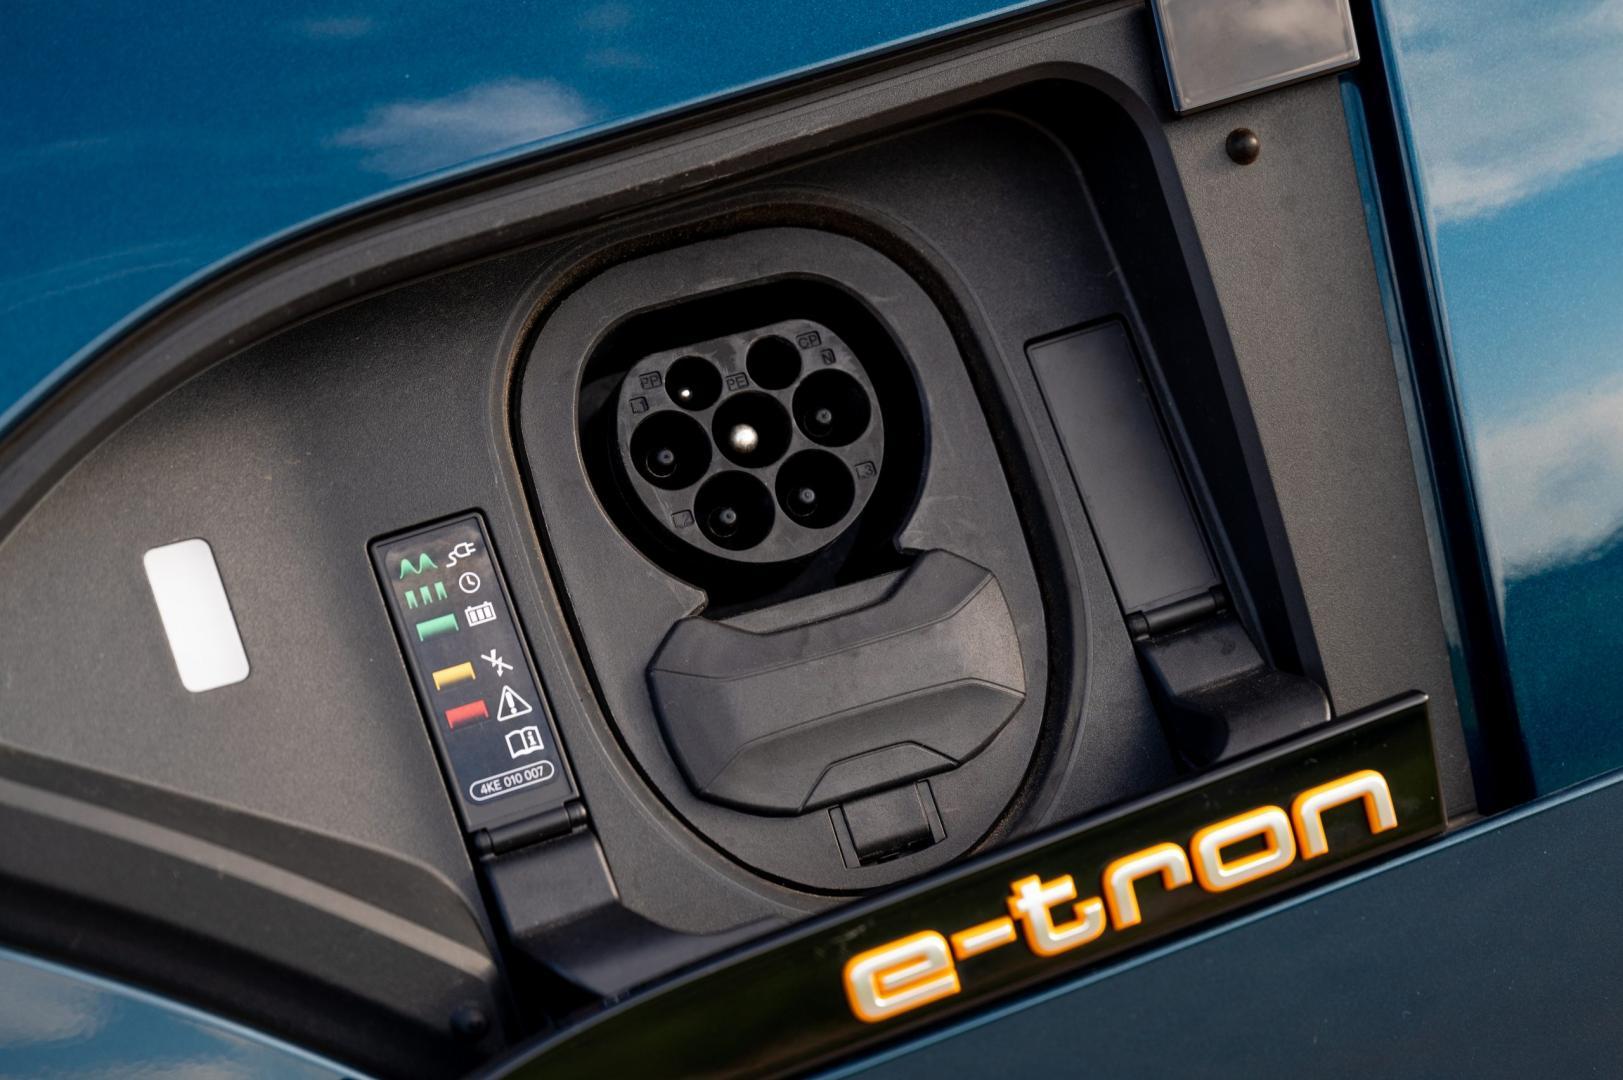 Laadaansluiting Audi e-tron